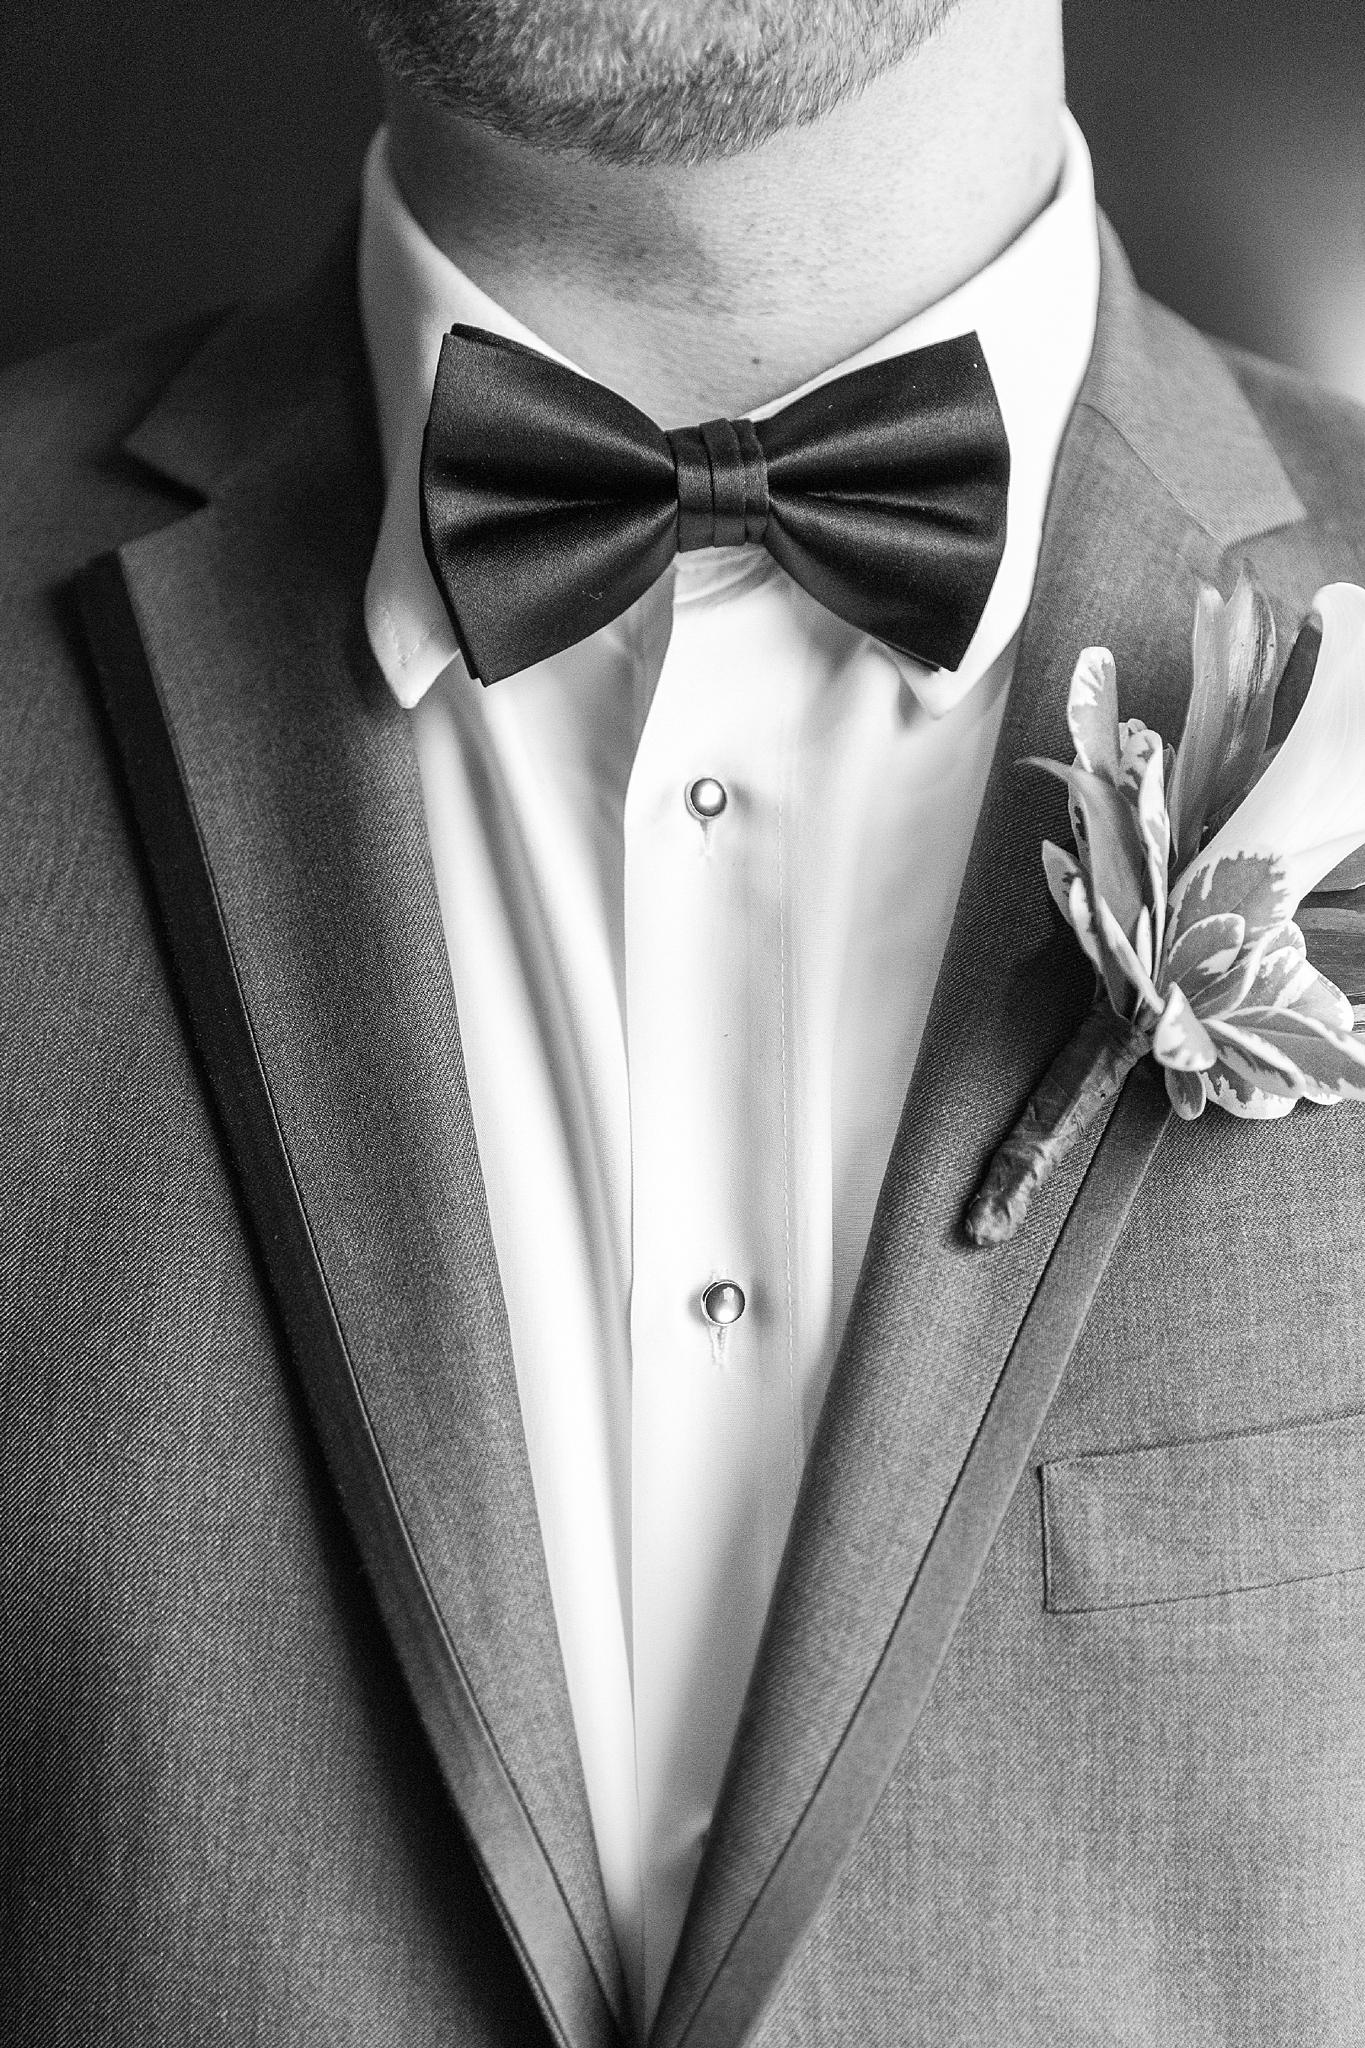 detroit-colony-club-wedding-regal-romantic-photography-in-detroit-mi-by-courtney-carolyn-photography_0006.jpg